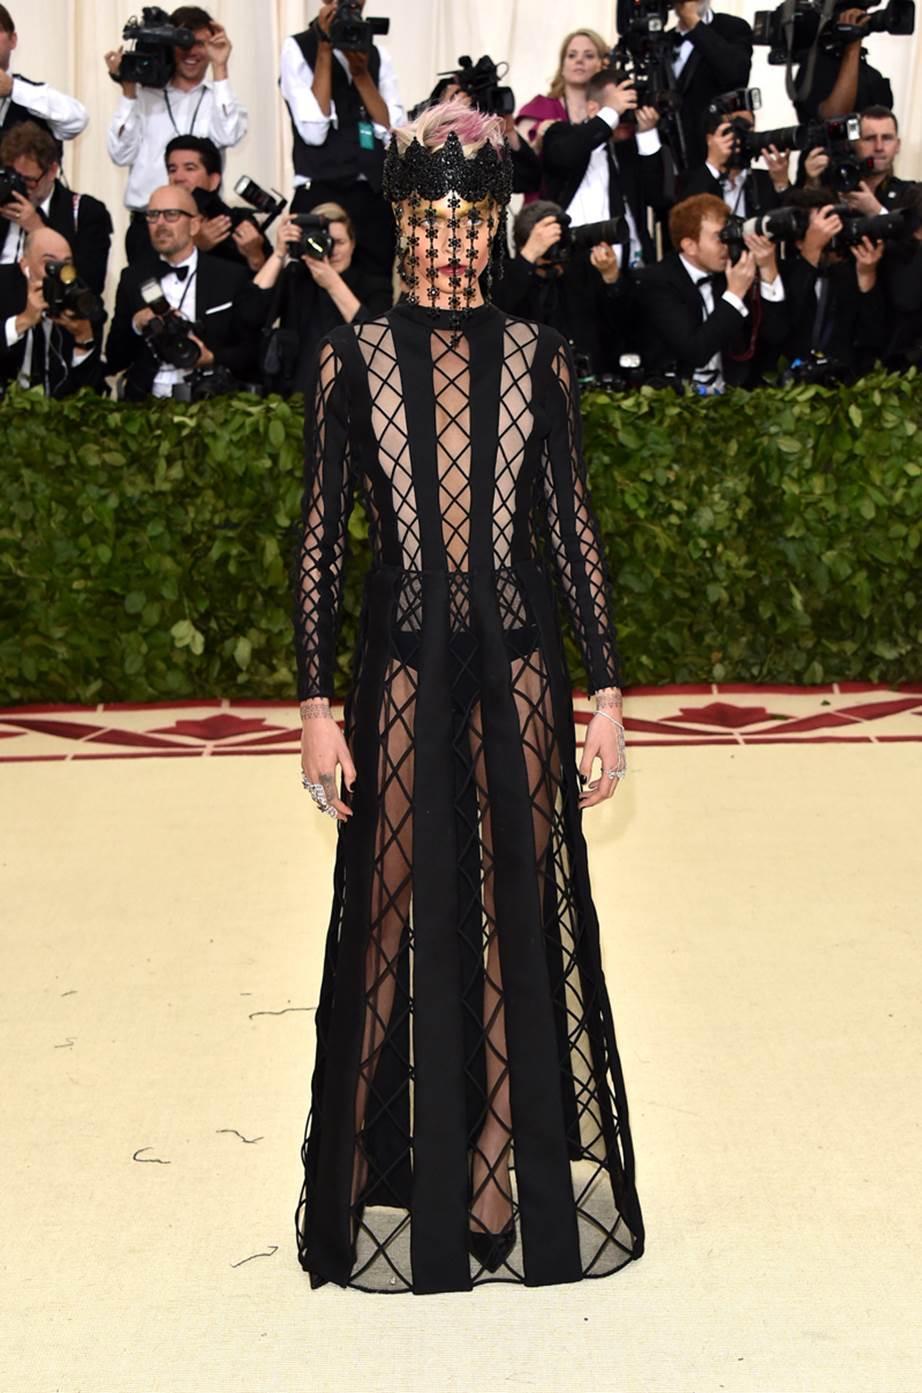 Cara Delevingne in Dior Couture - VERDDE